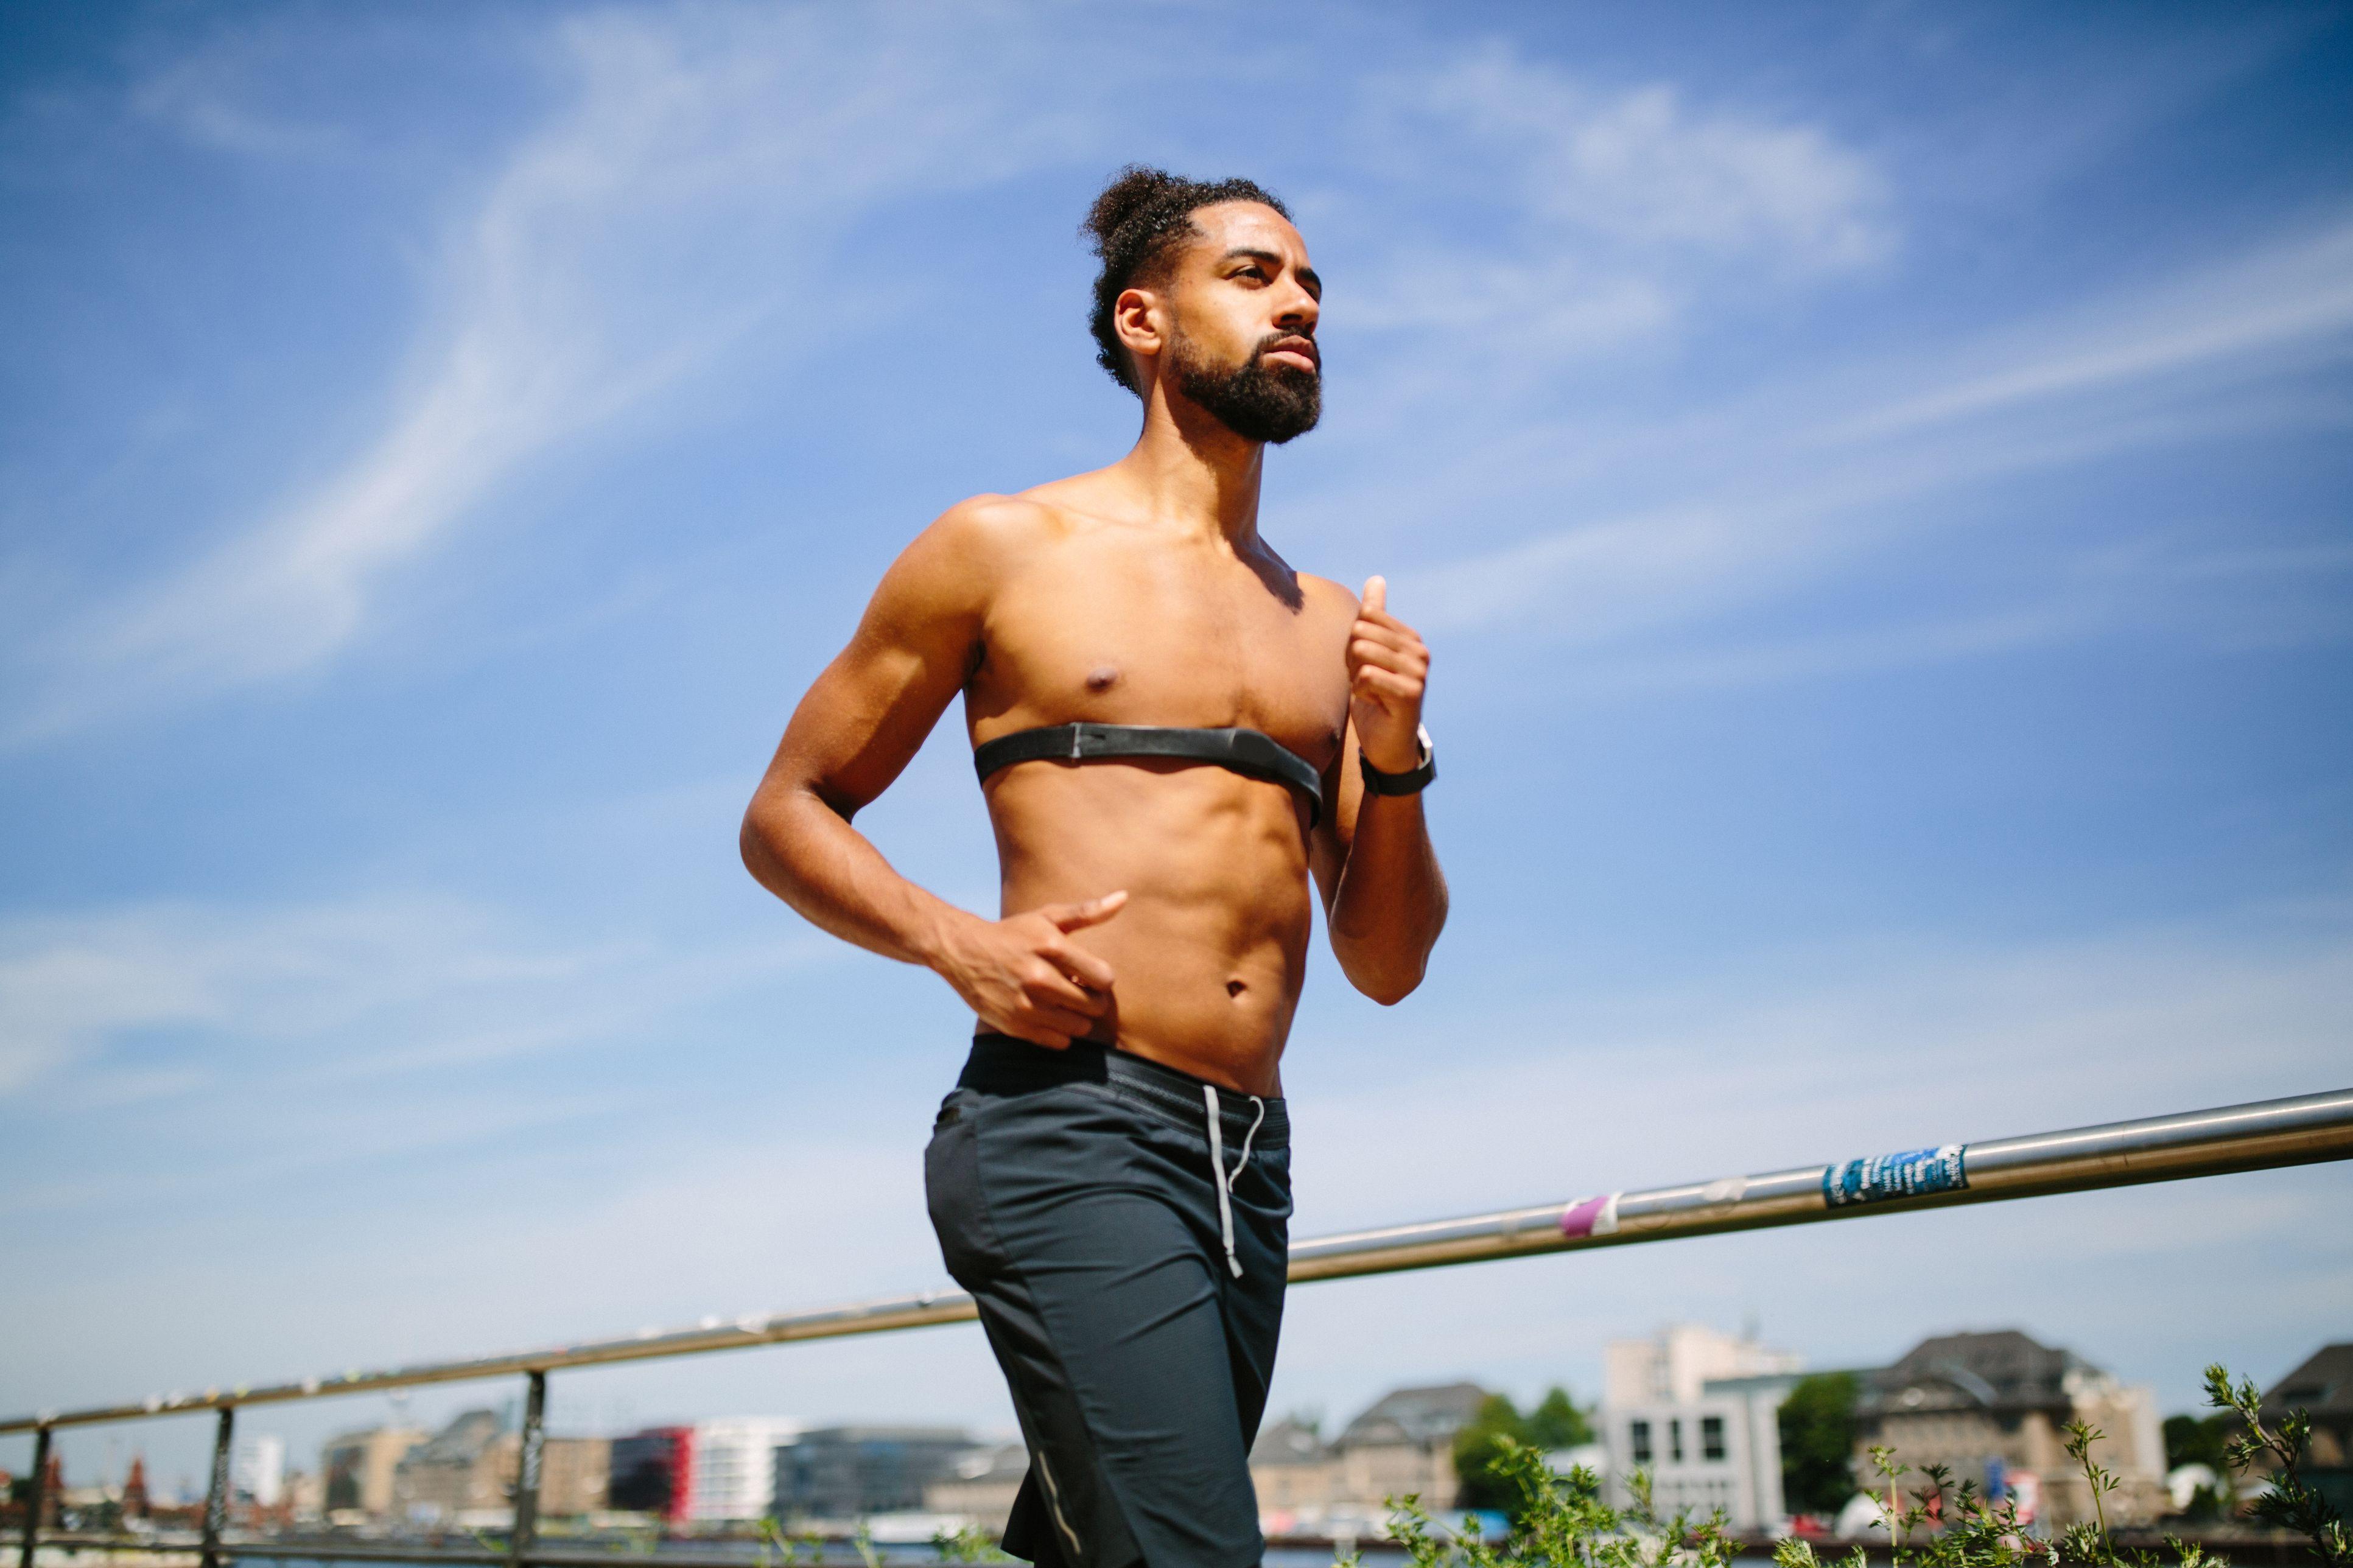 health benefits of running cross country